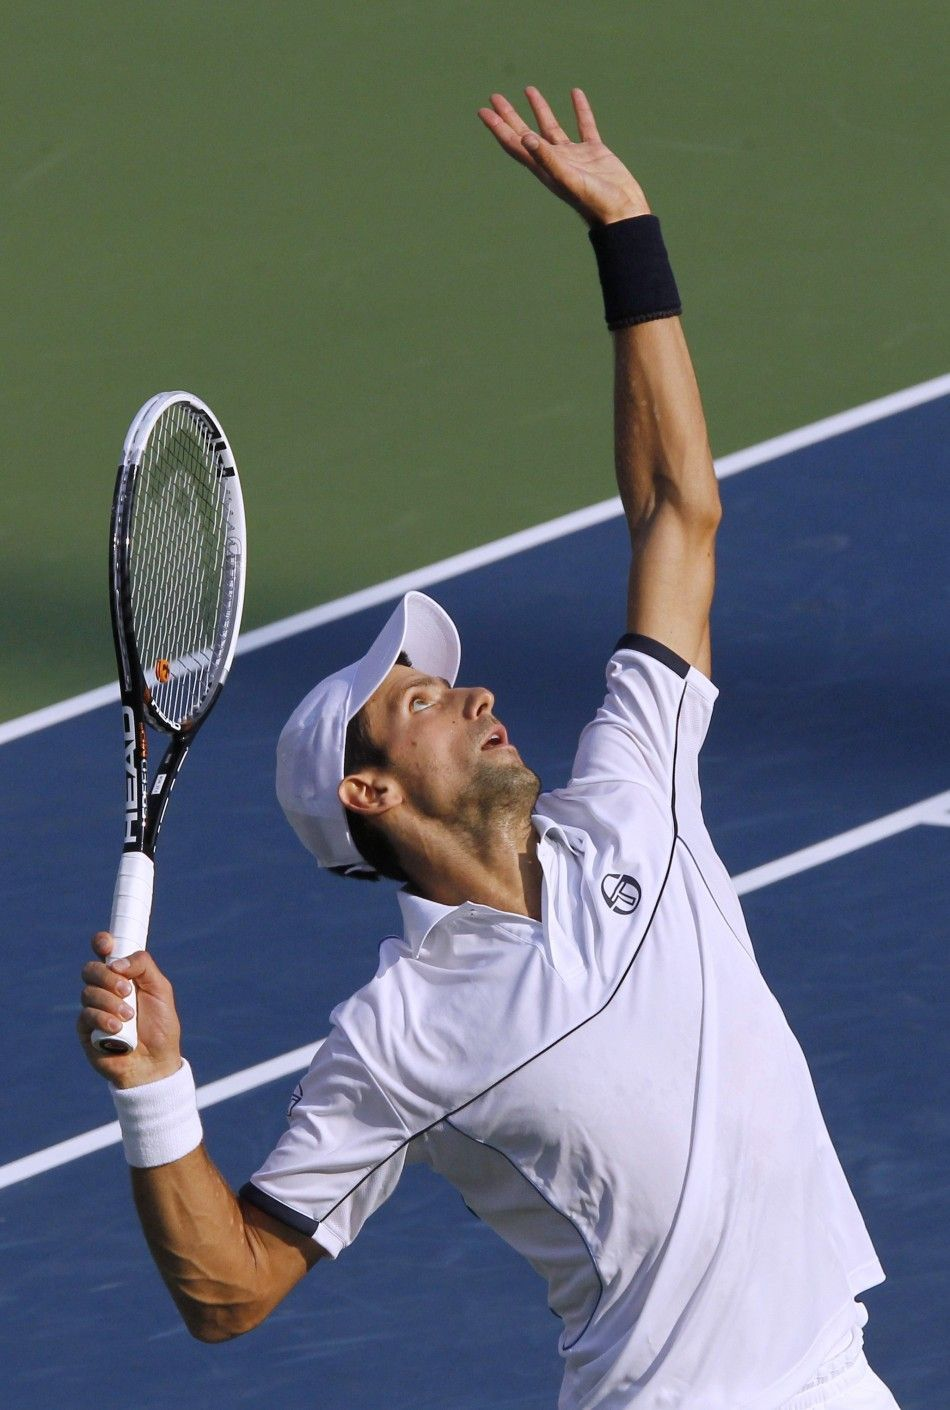 Novak Djokovic S Trophy Power Position On Serve Learnabouttennis Tennis Serve Tennis Workout Tennis